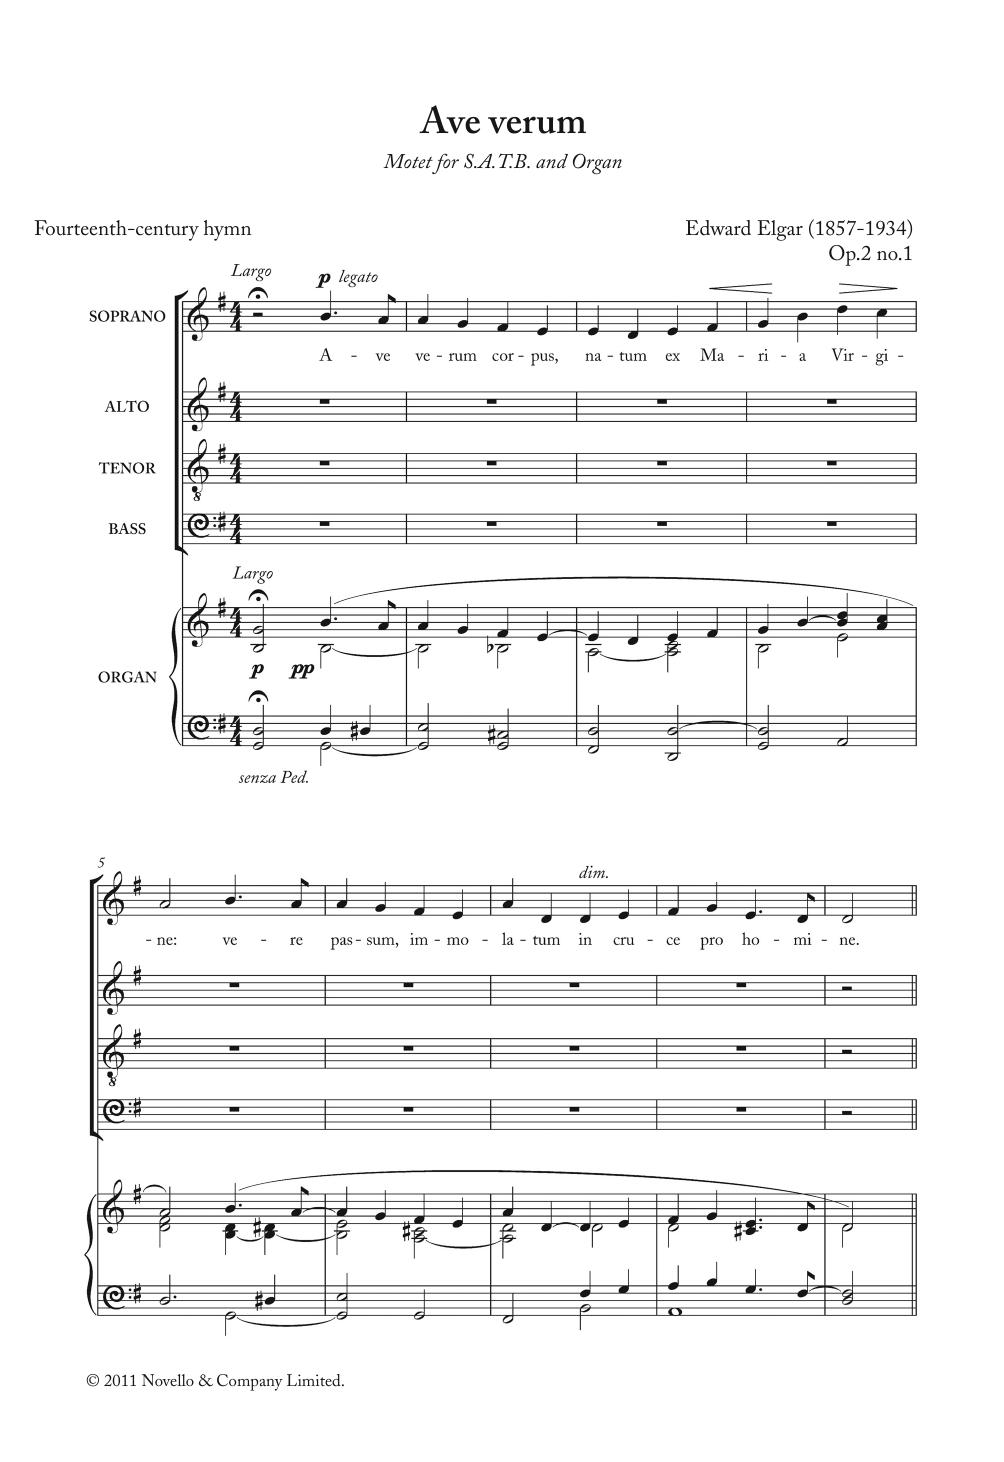 Edward Elgar - Ave Verum Corpus Op. 2, No. 1